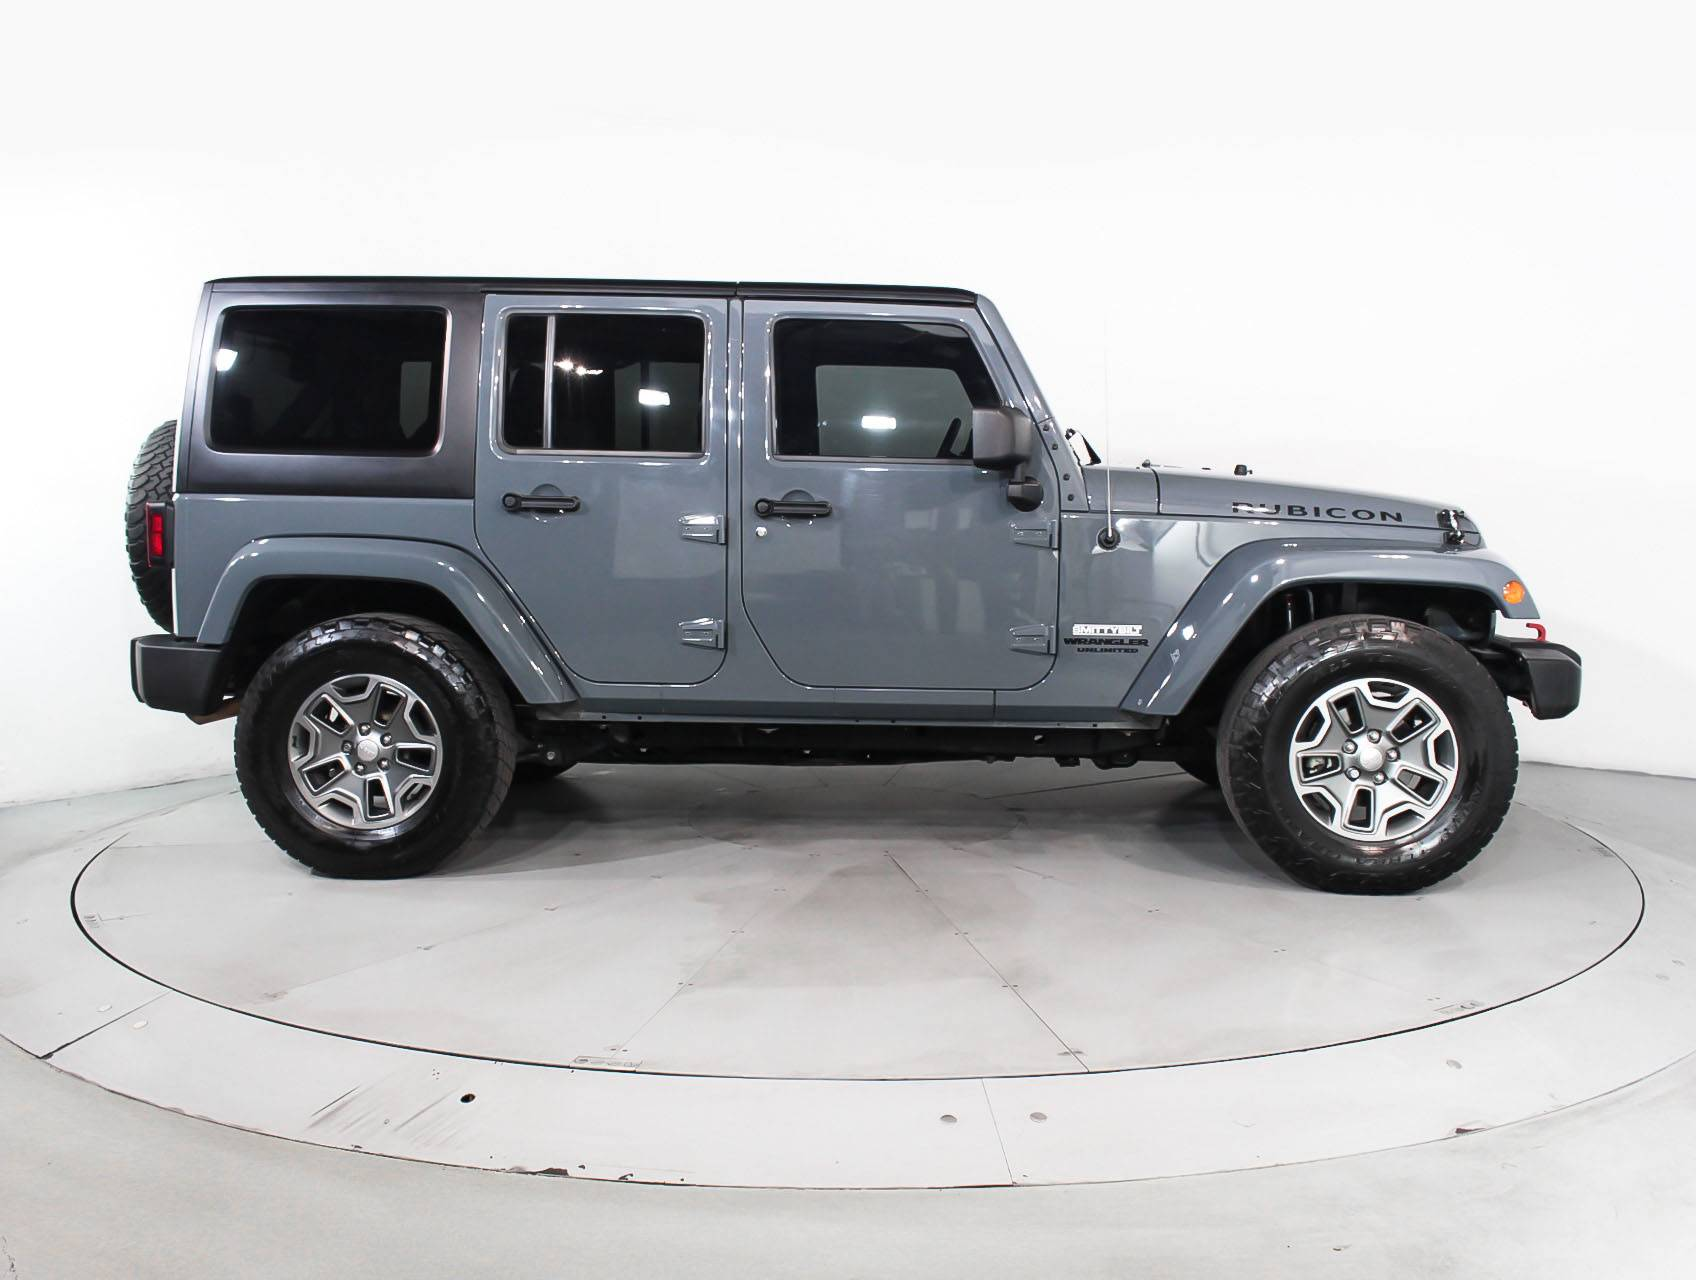 used vienna main stock for l htm c hard unlimited va wrangler rubicon rock jeep